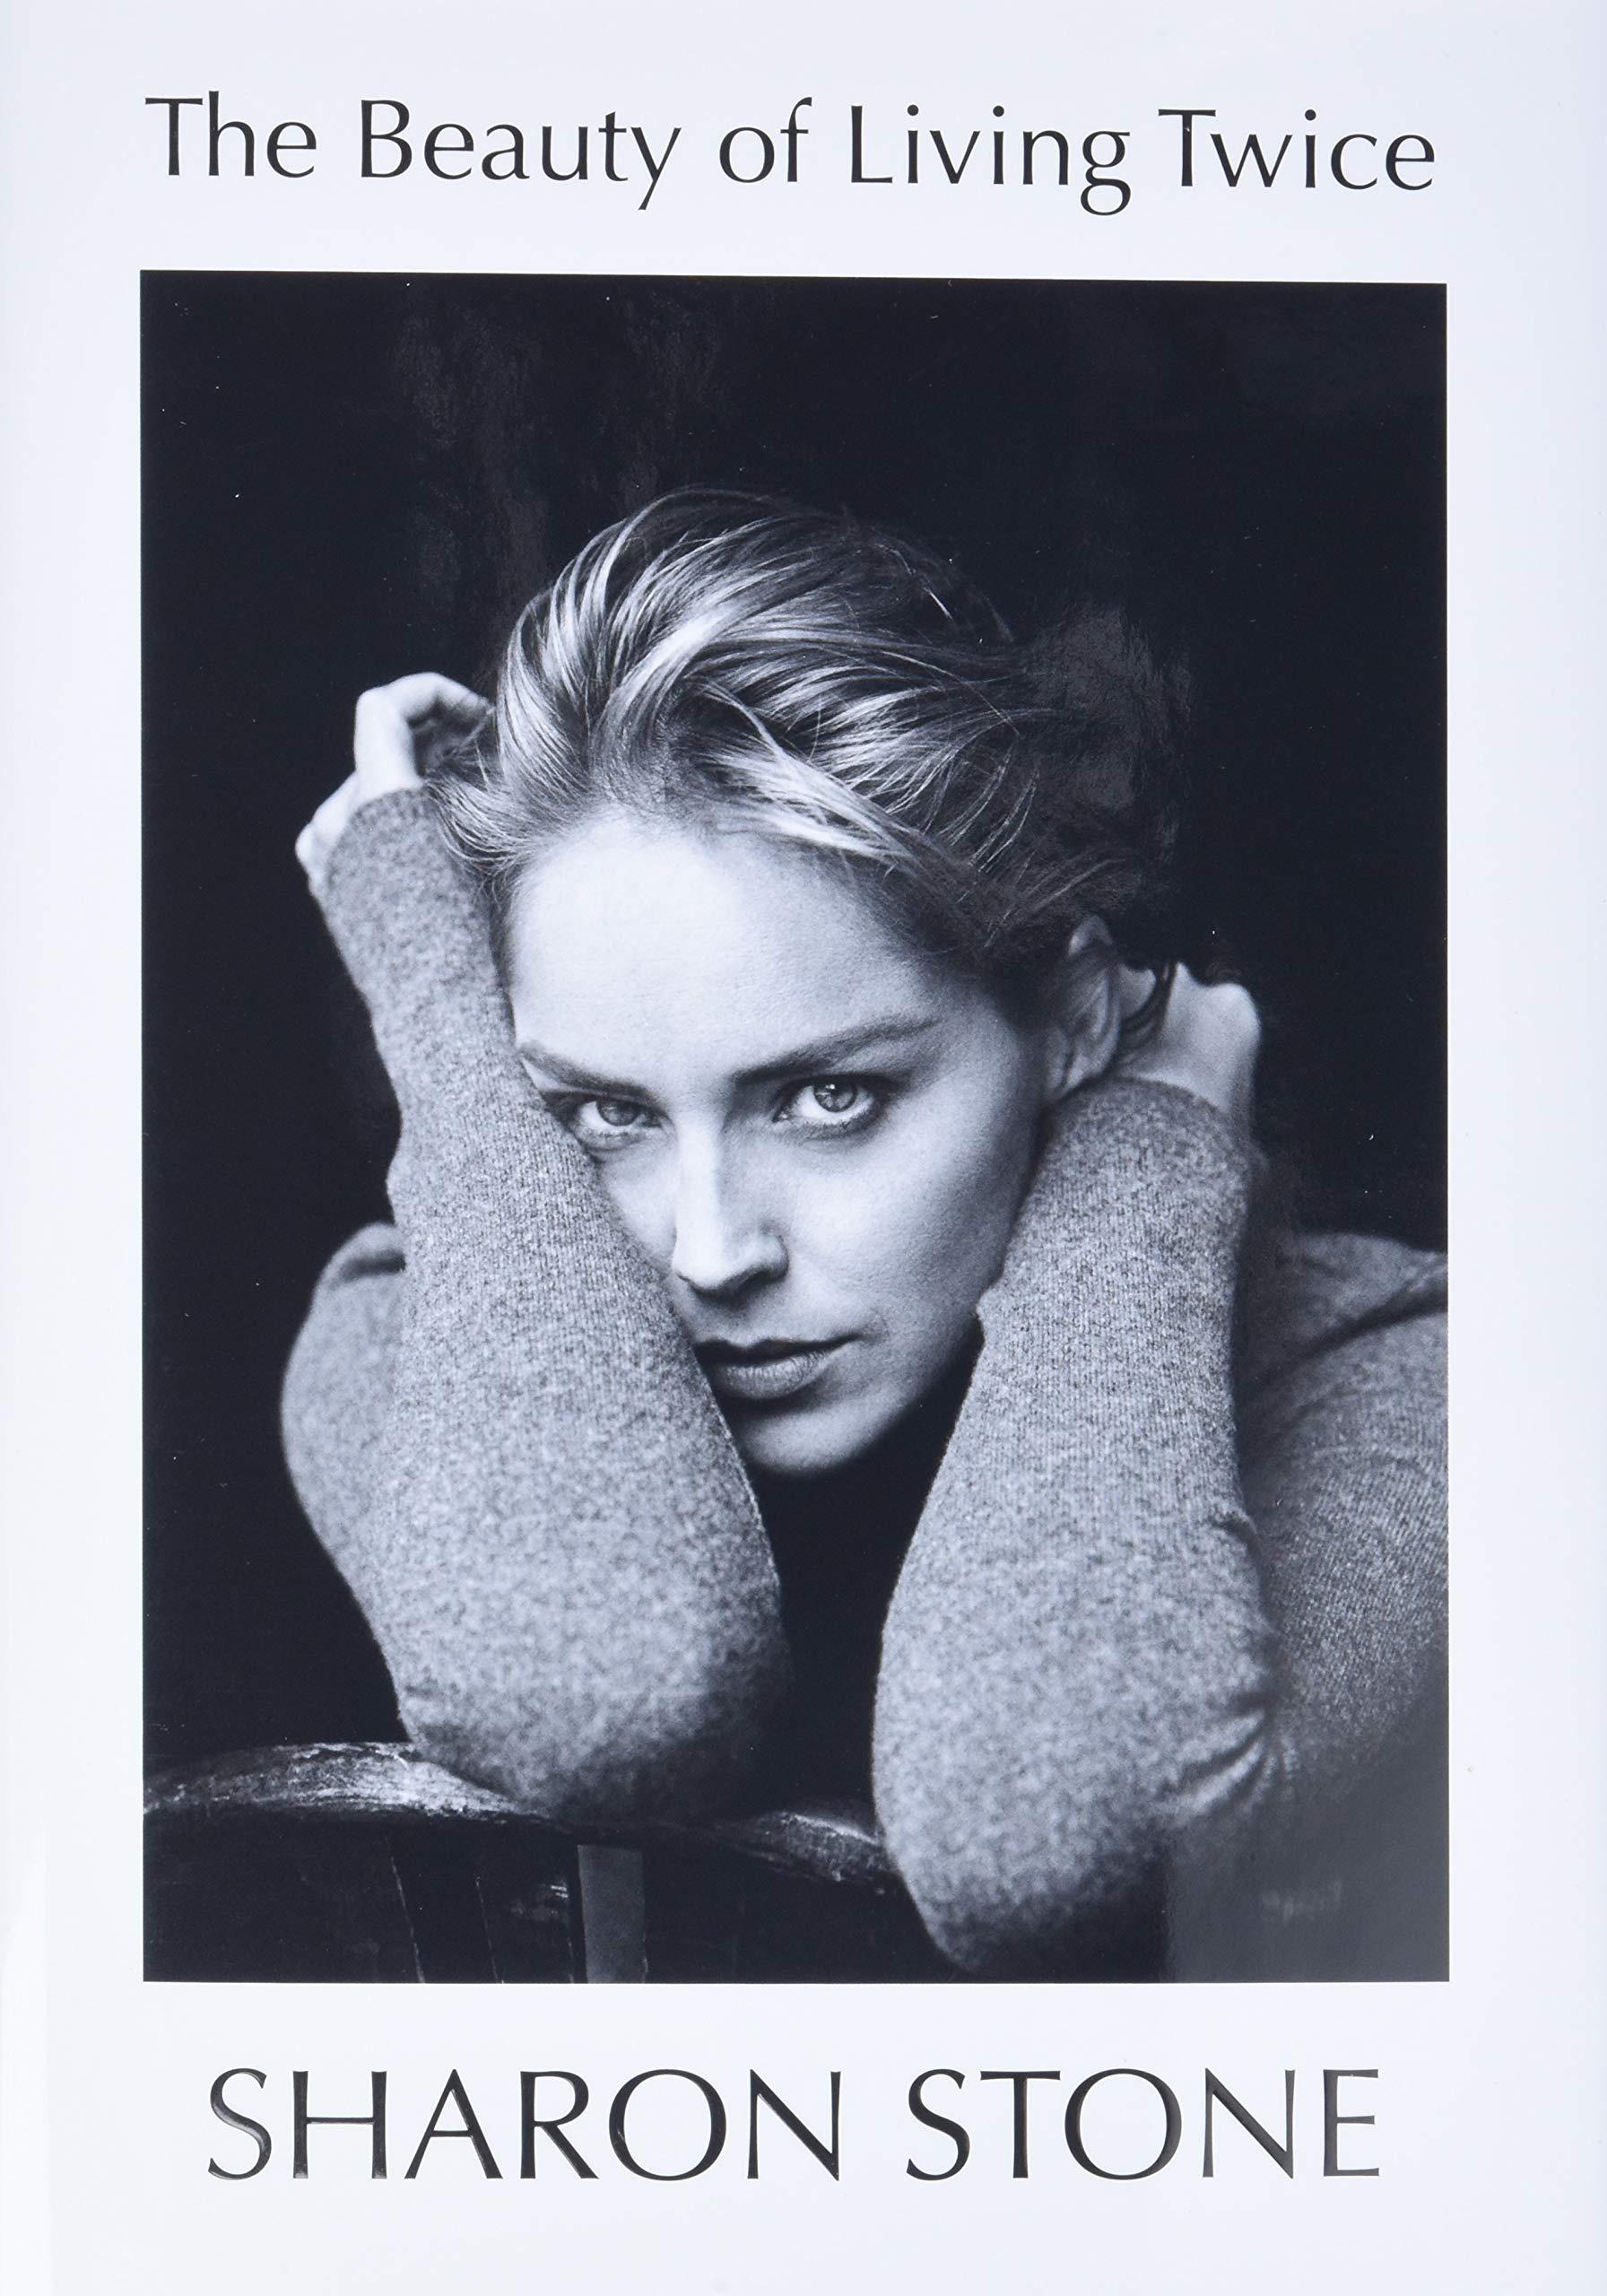 Hoi ky Sharon Stone anh 2